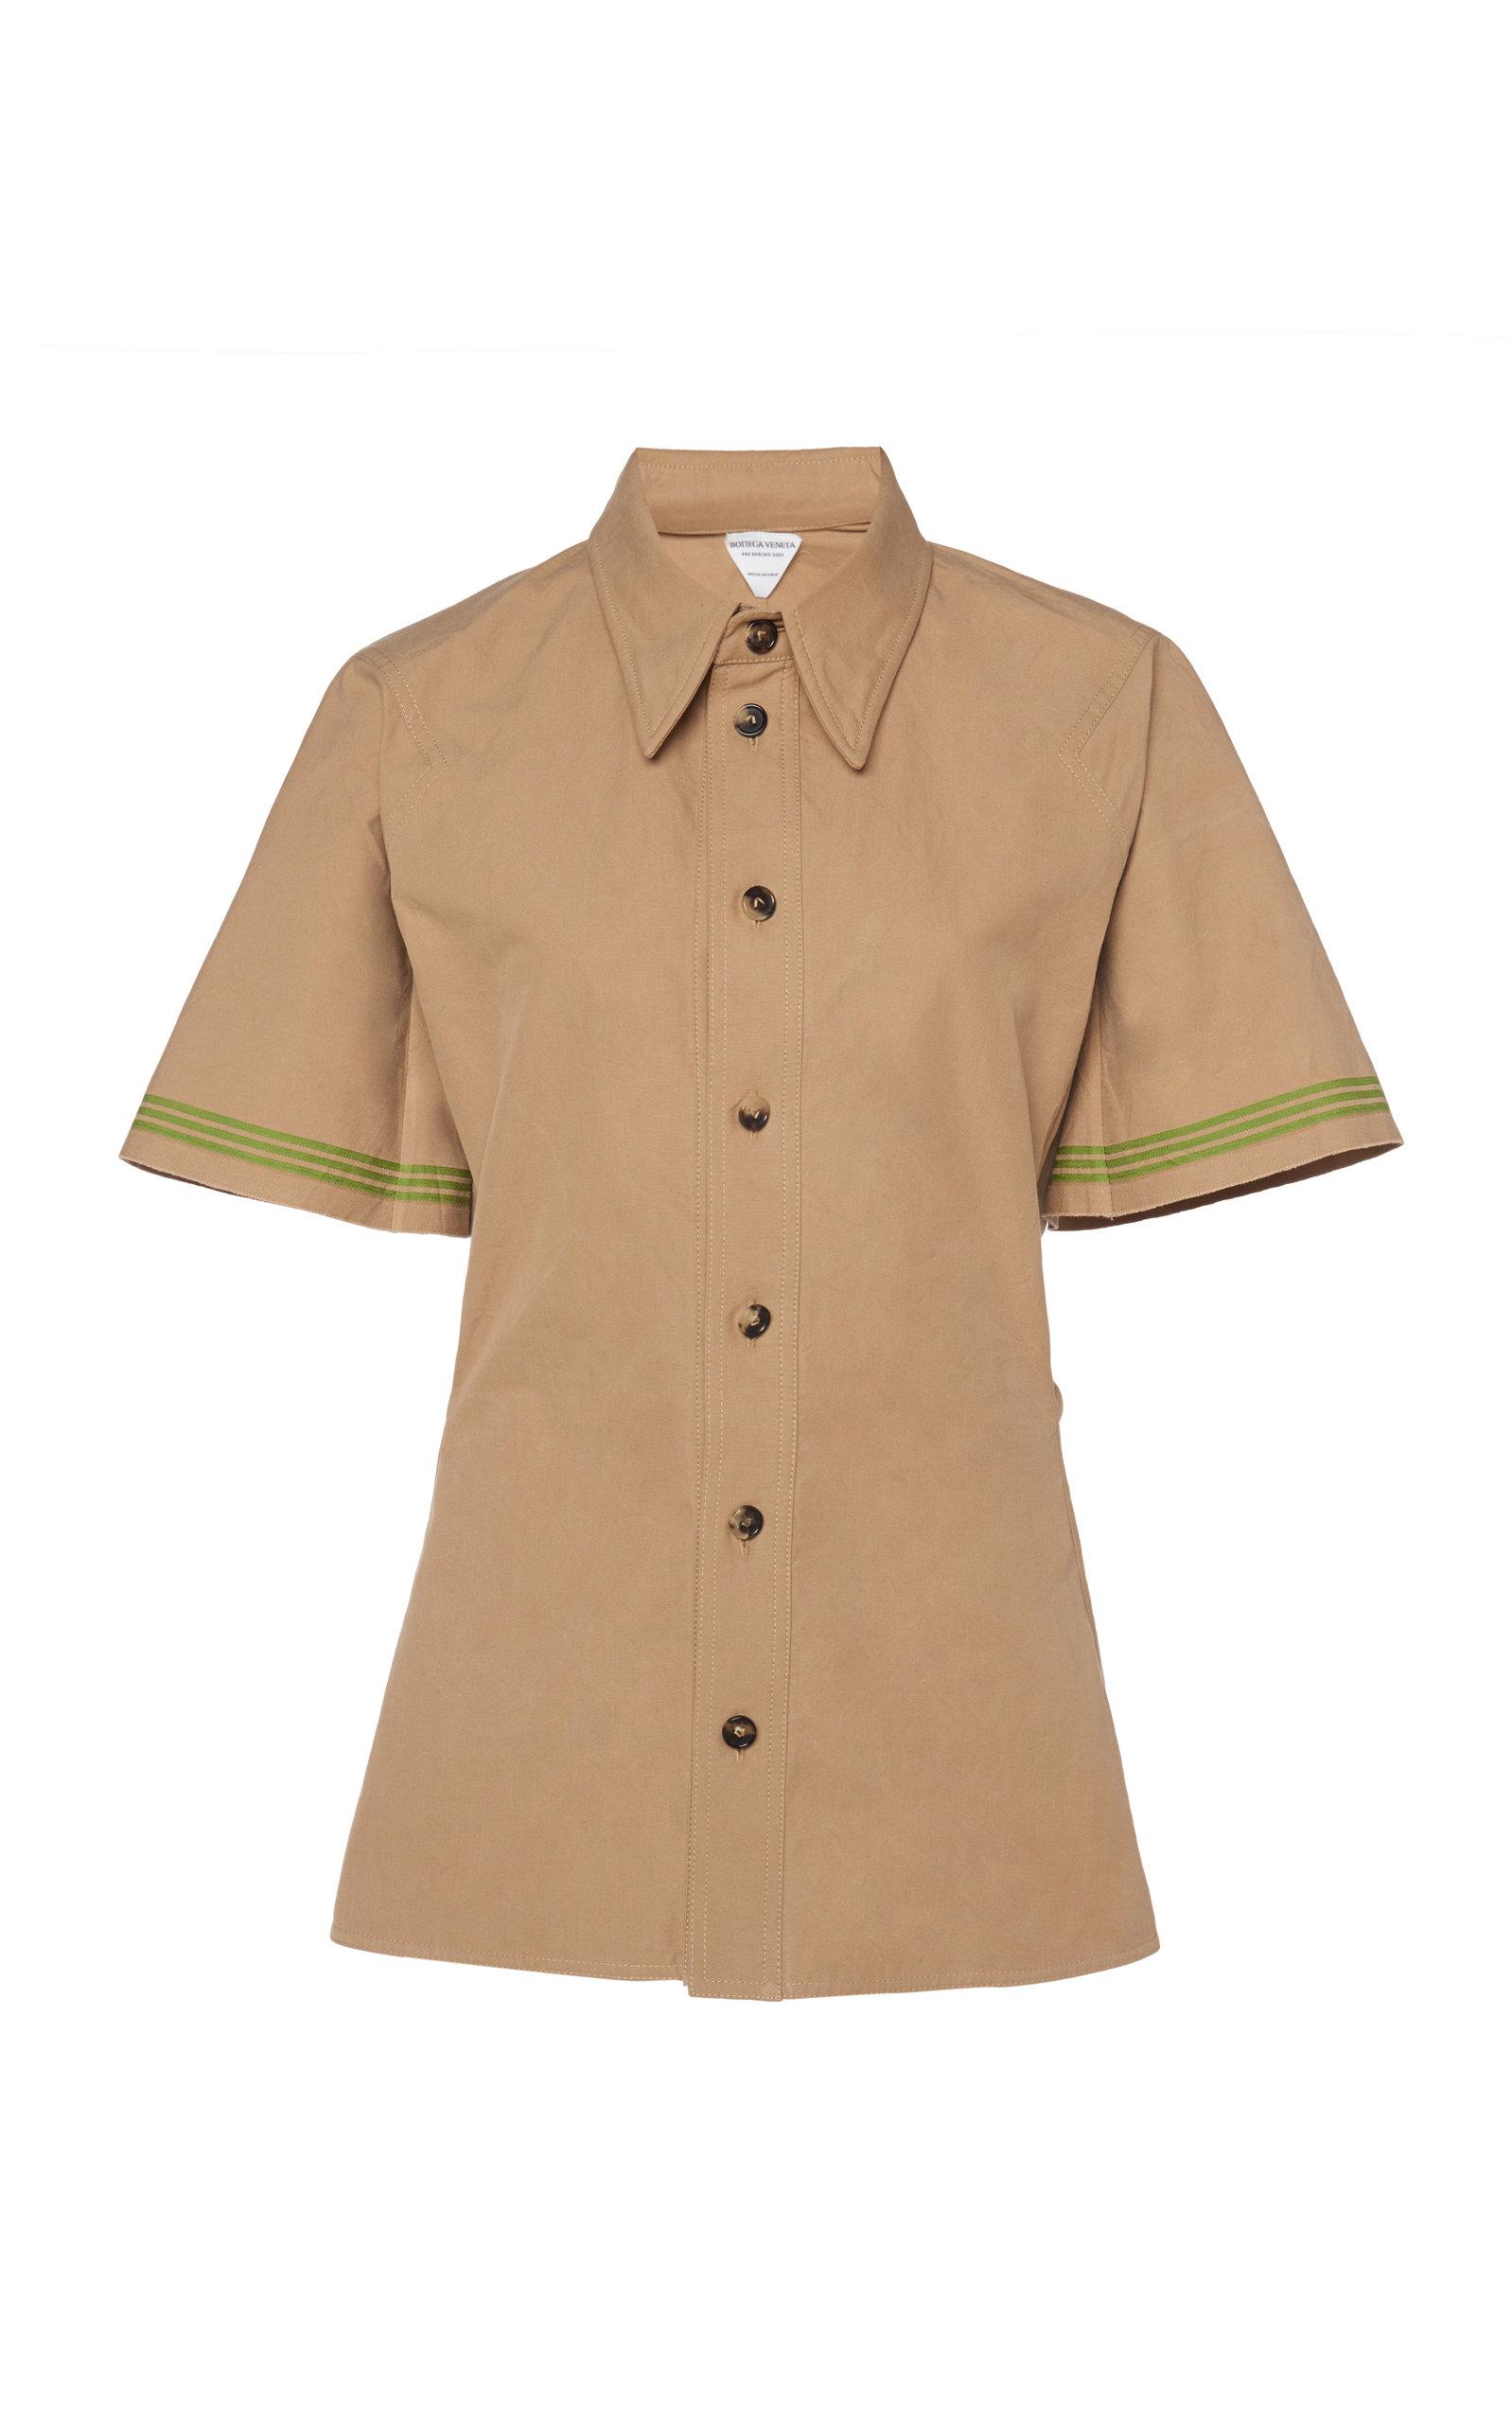 Bottega Veneta – Women's Heavy Cotton Button-Down Shirt – Neutral – Moda Operandi